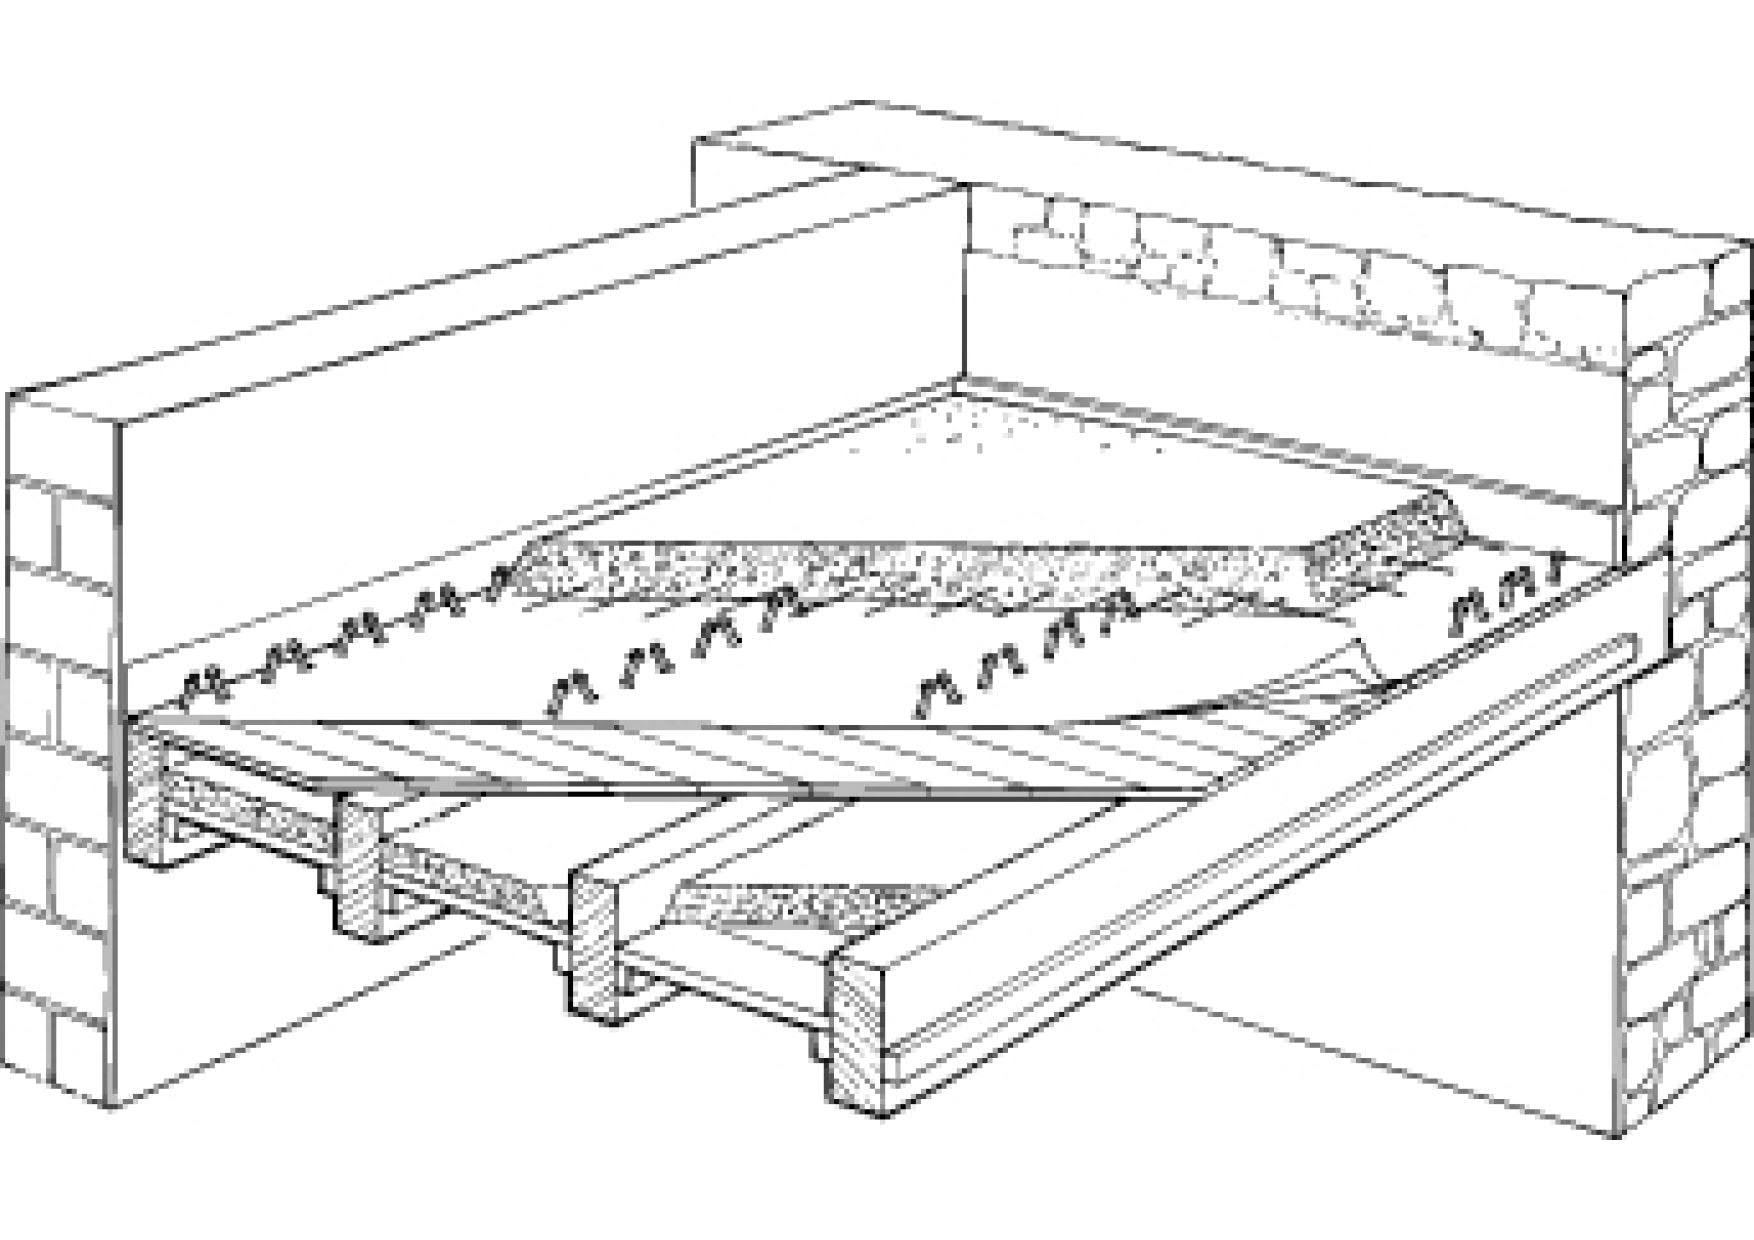 Holz-Beton-Verbund